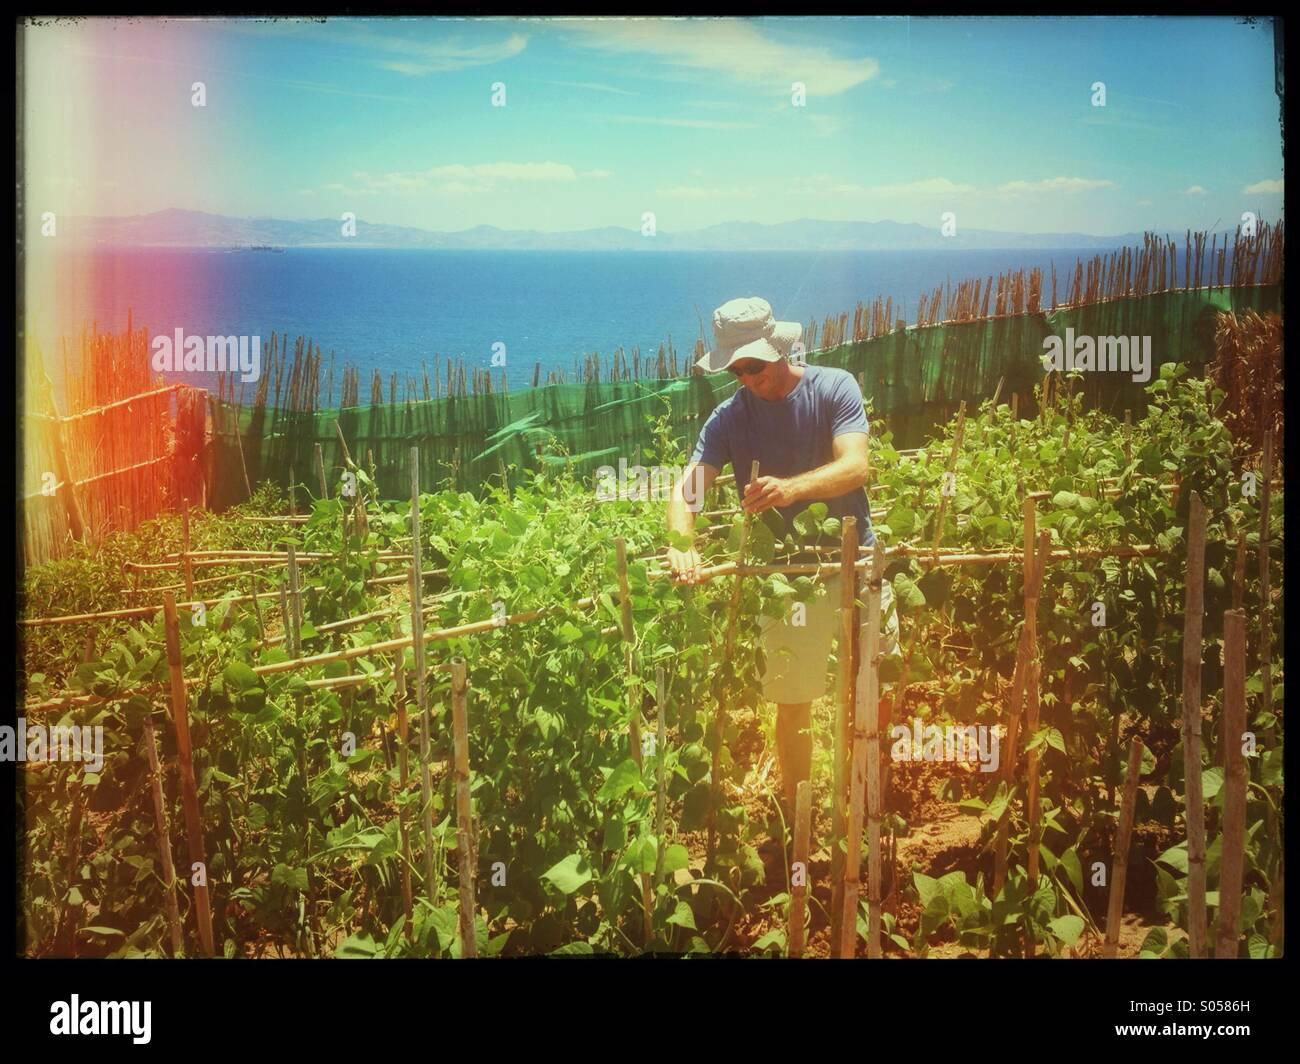 Man in Tarifa, Spain tending runner bean plants in his garden.  The Moroccan coastline visible in background. - Stock Image